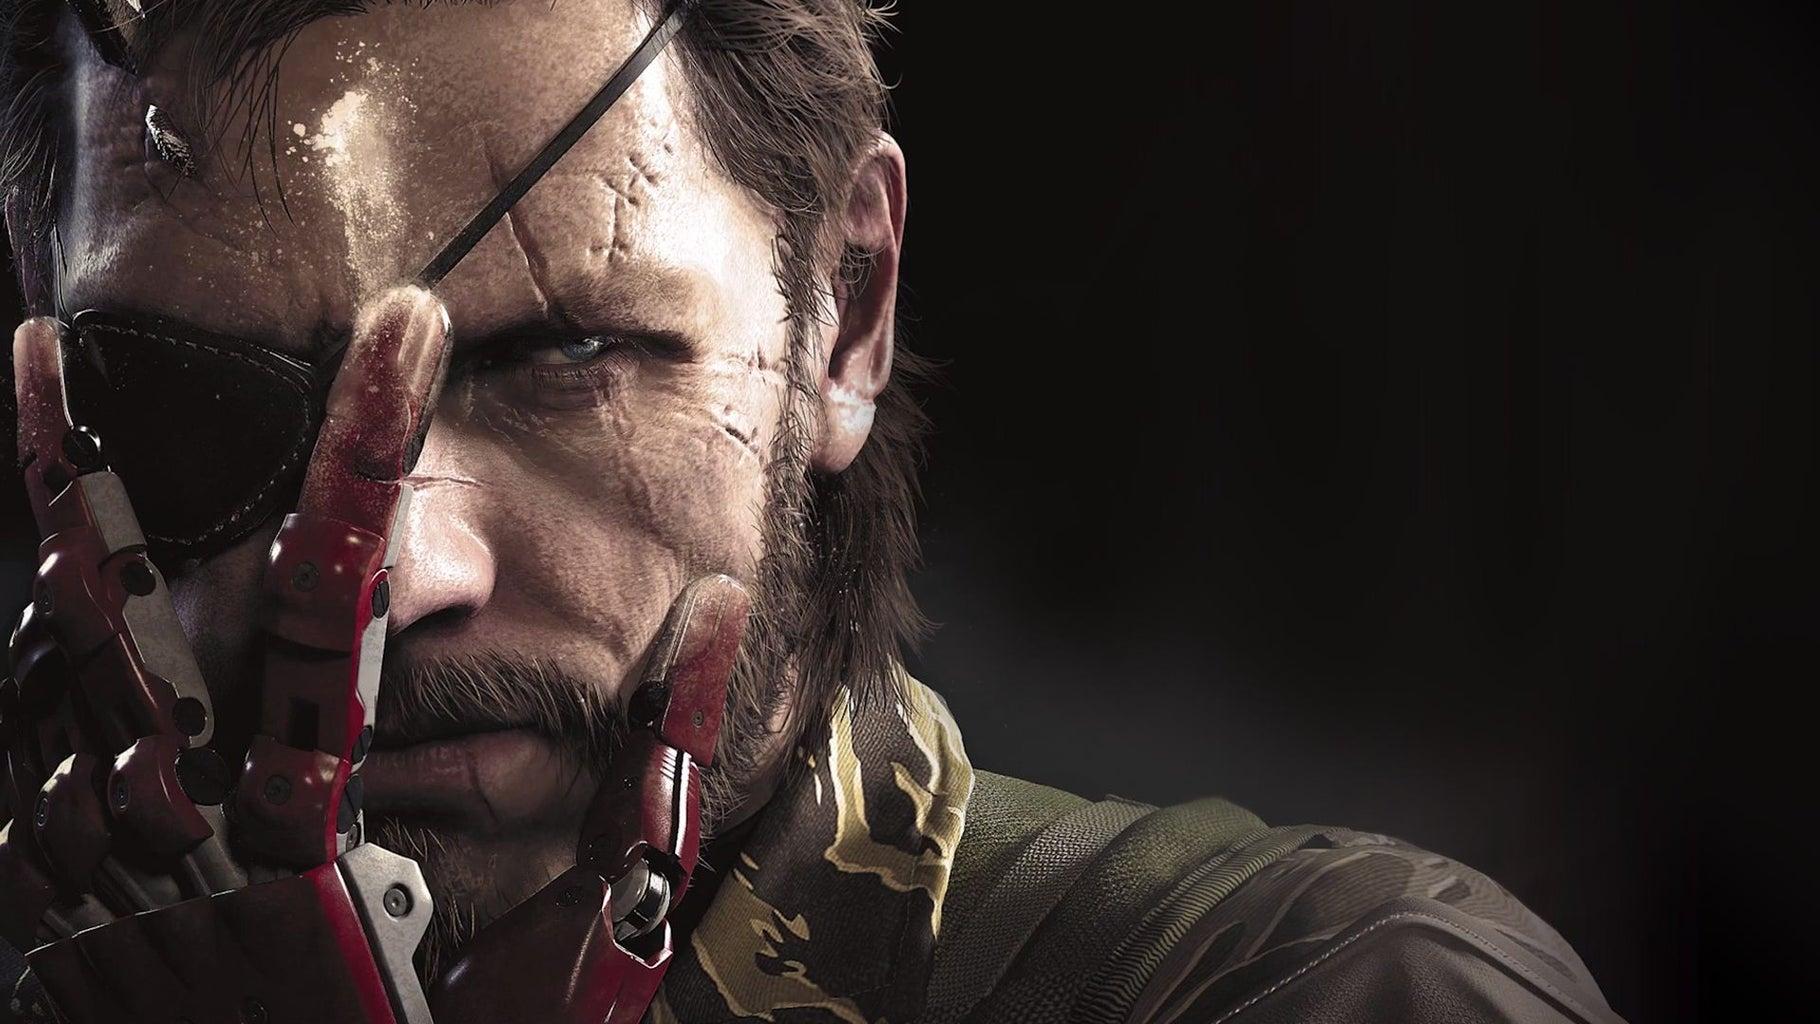 Metal Gear Solid V: Big Boss Eye Patch